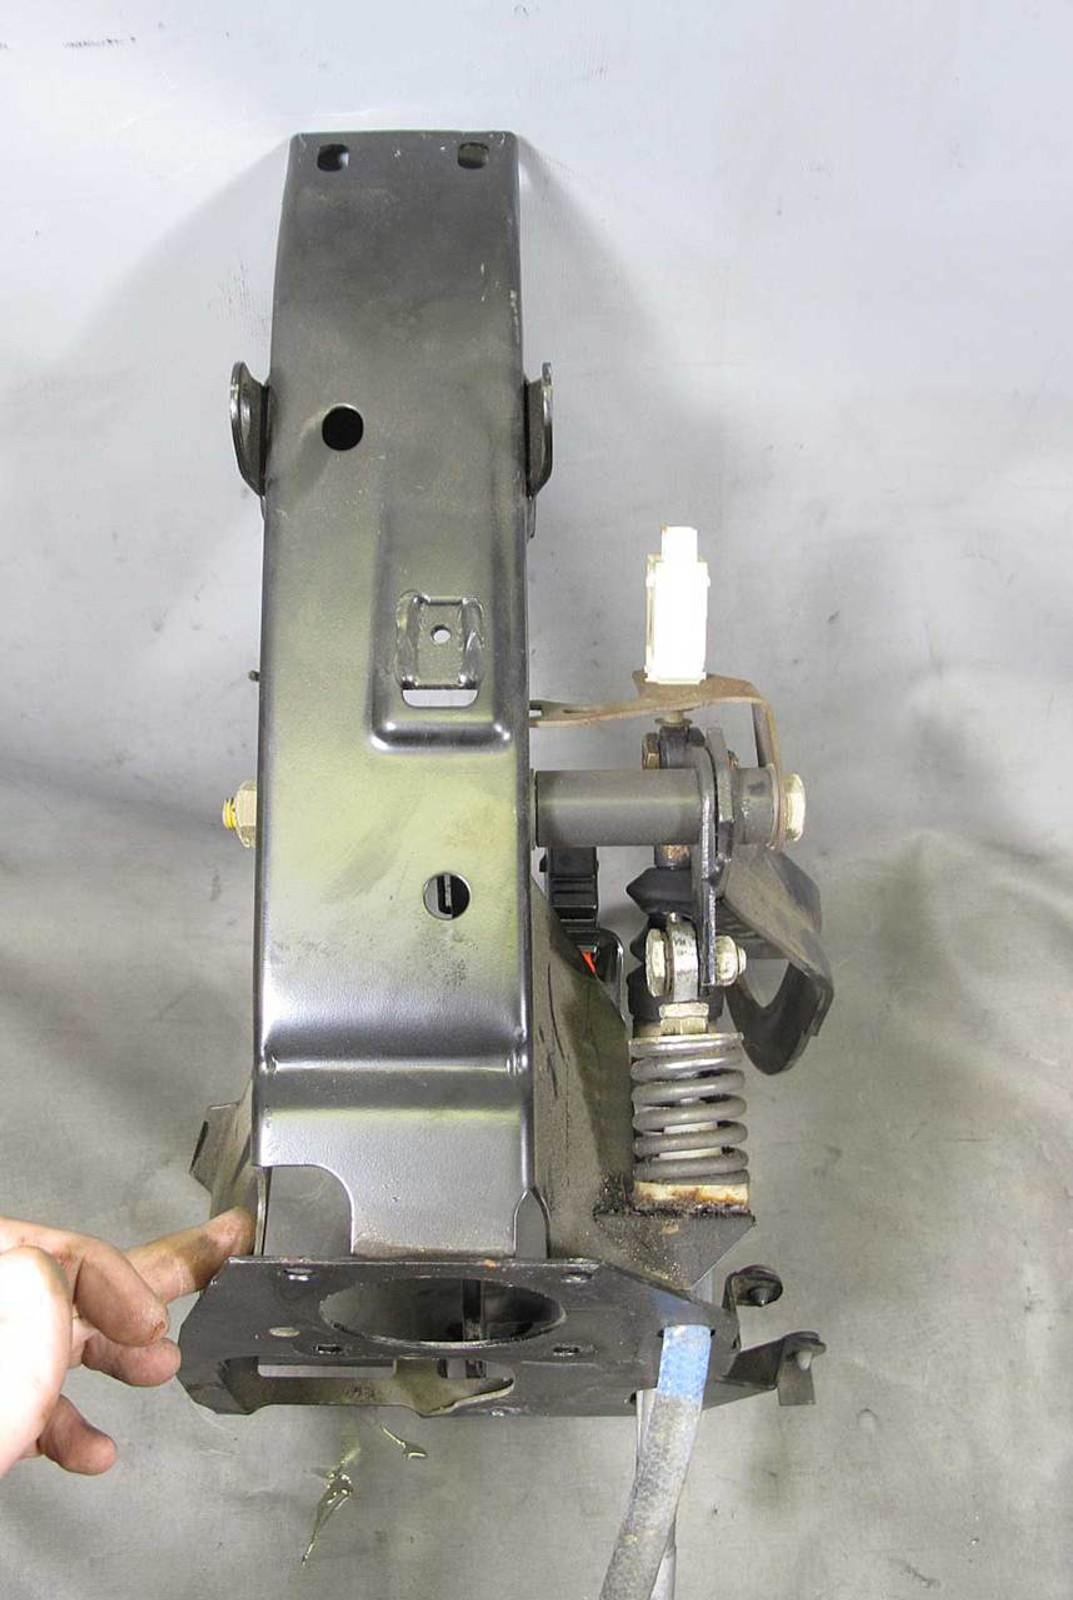 BMW E31 E34 E32 Clutch Pedals Bracket Bare Box Manual Trans M5 850 1988-1997 OEM